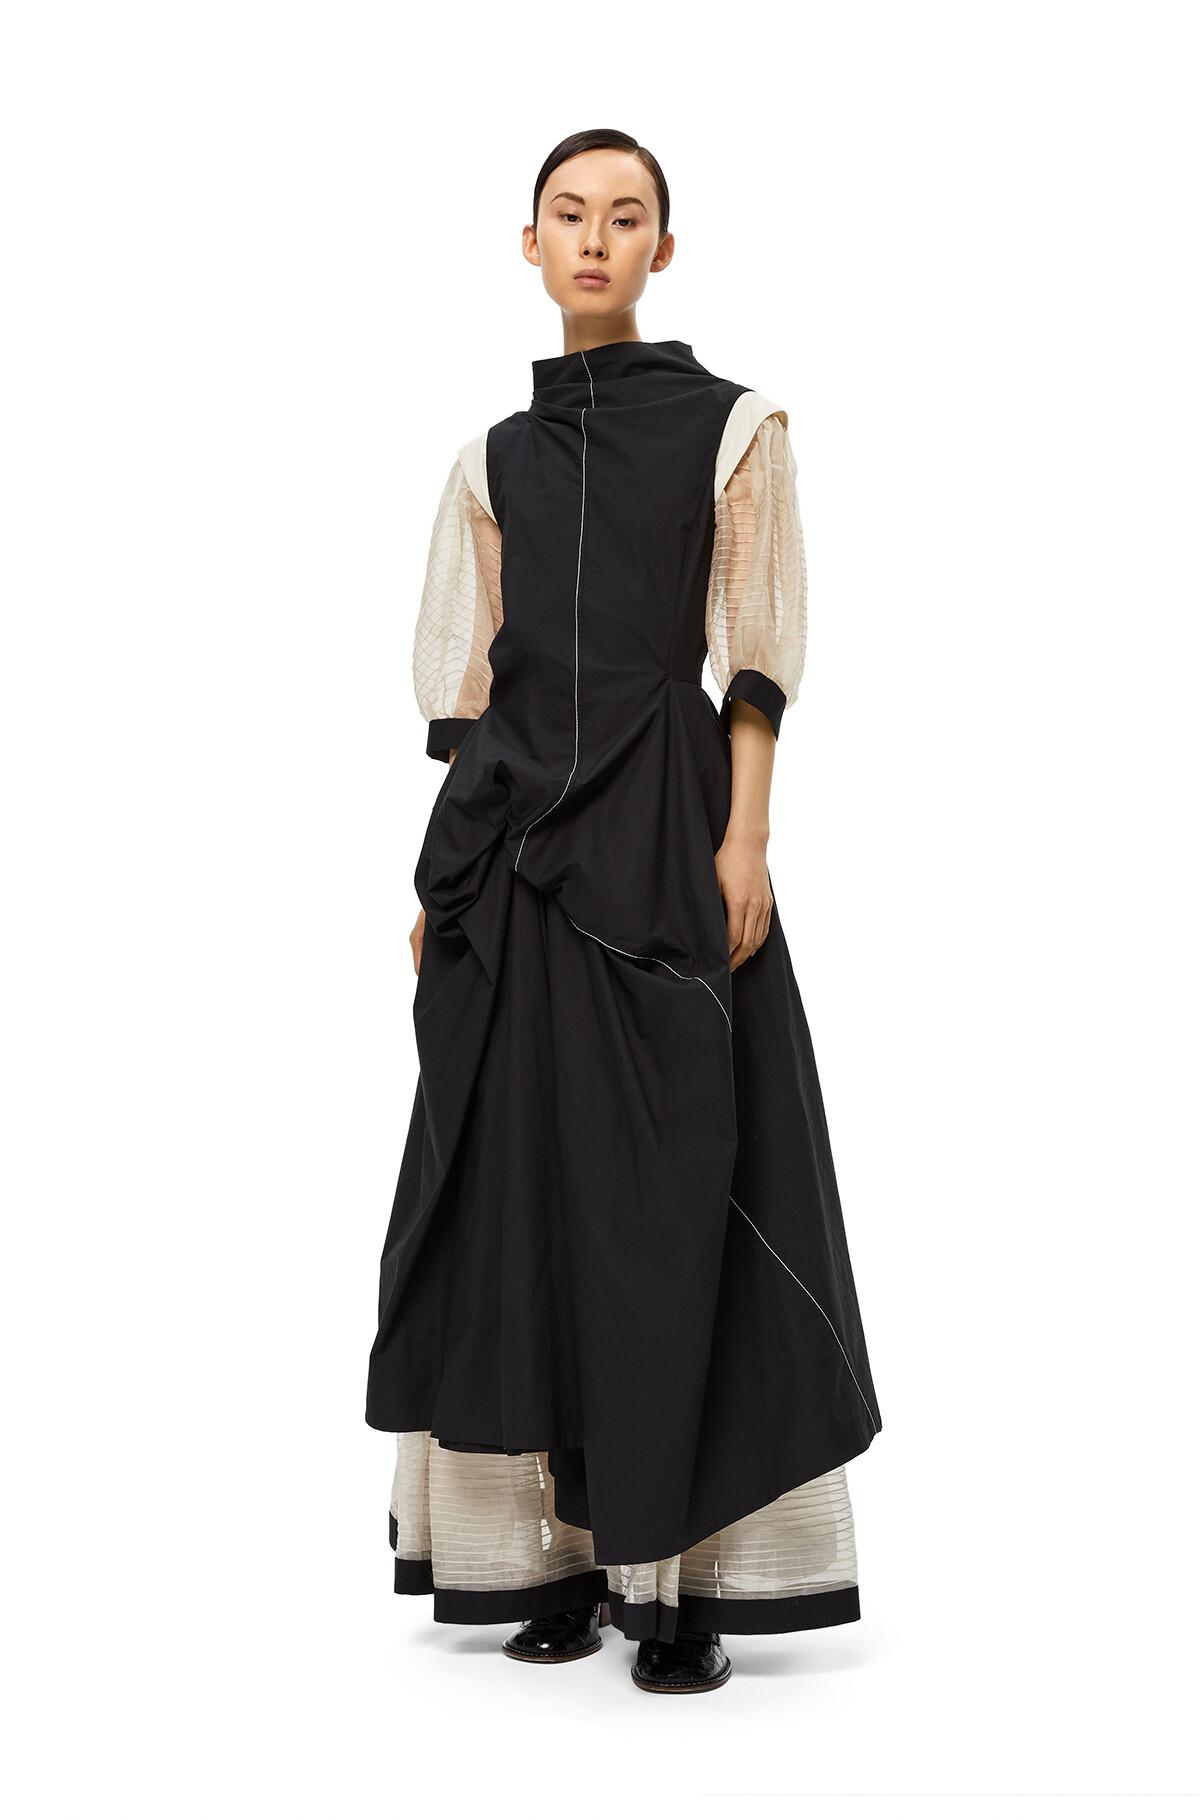 LOEWE Gathered Dress Black/Ecru front